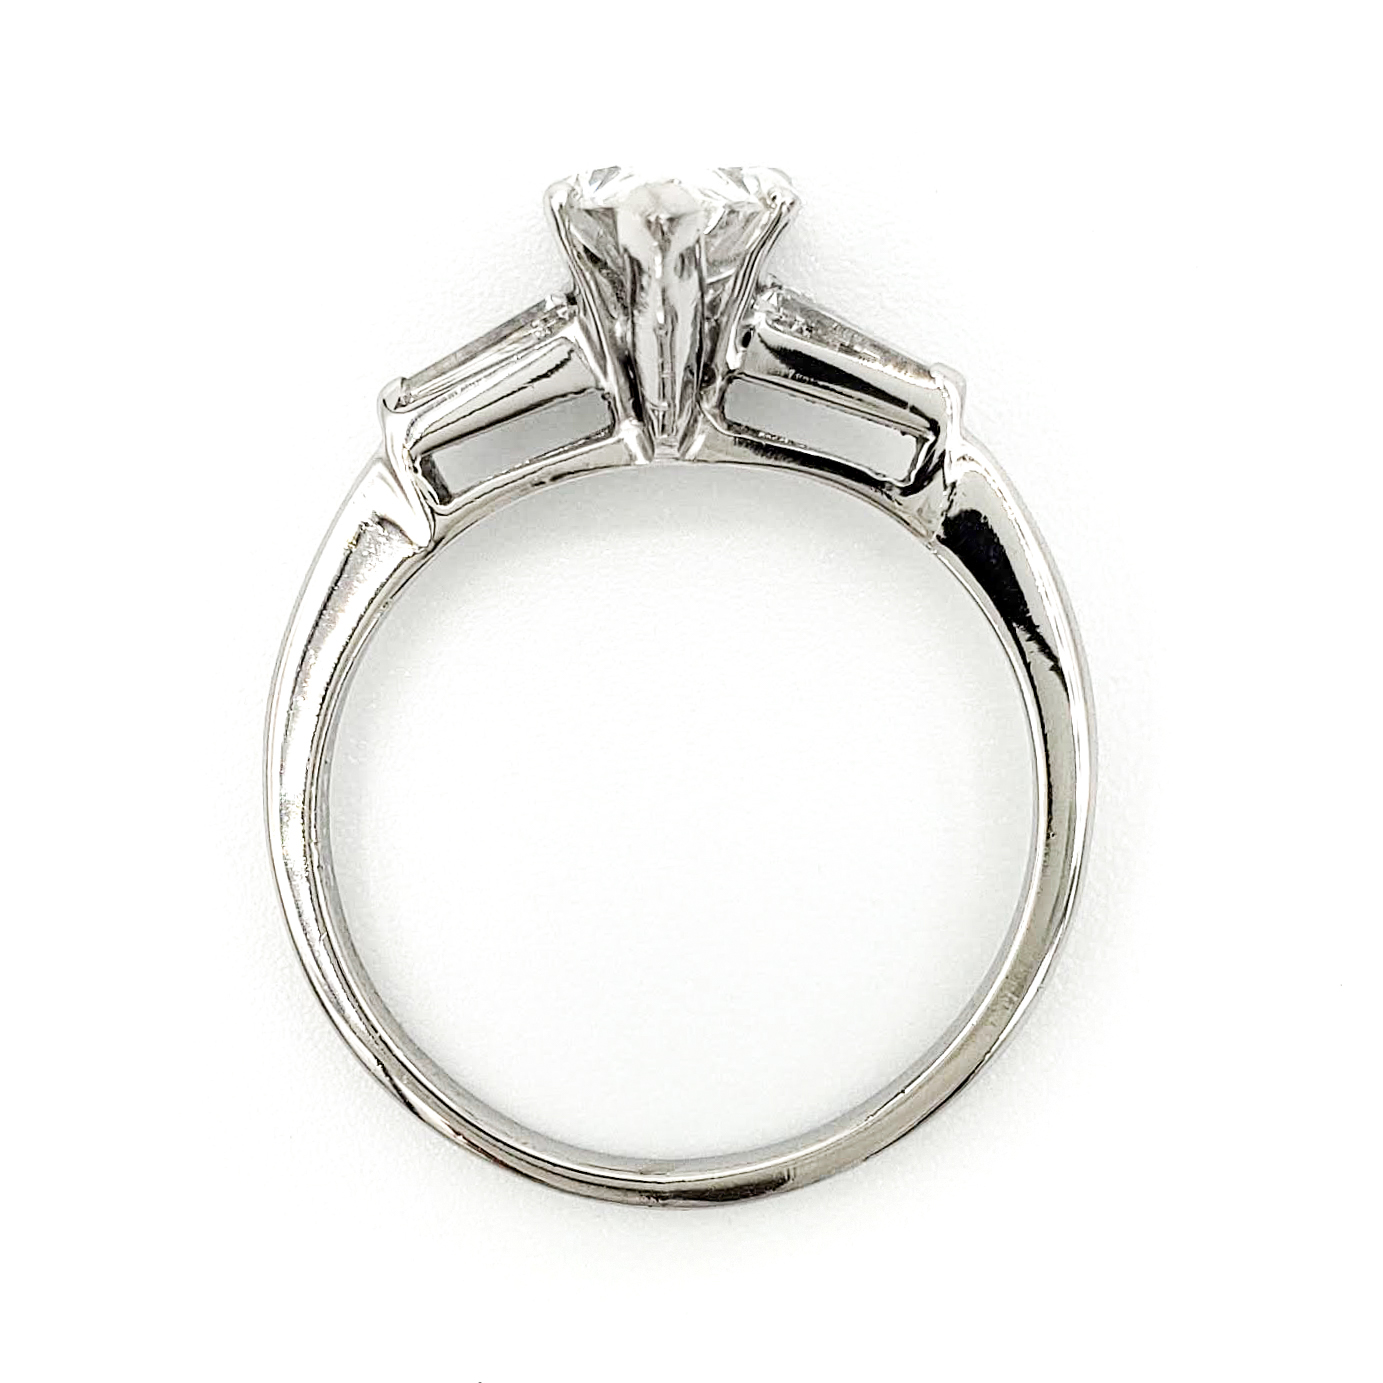 vintage-platinum-engagement-ring-with-1-16-carat-pear-brilliant-cut-diamond-egl-f-vs2